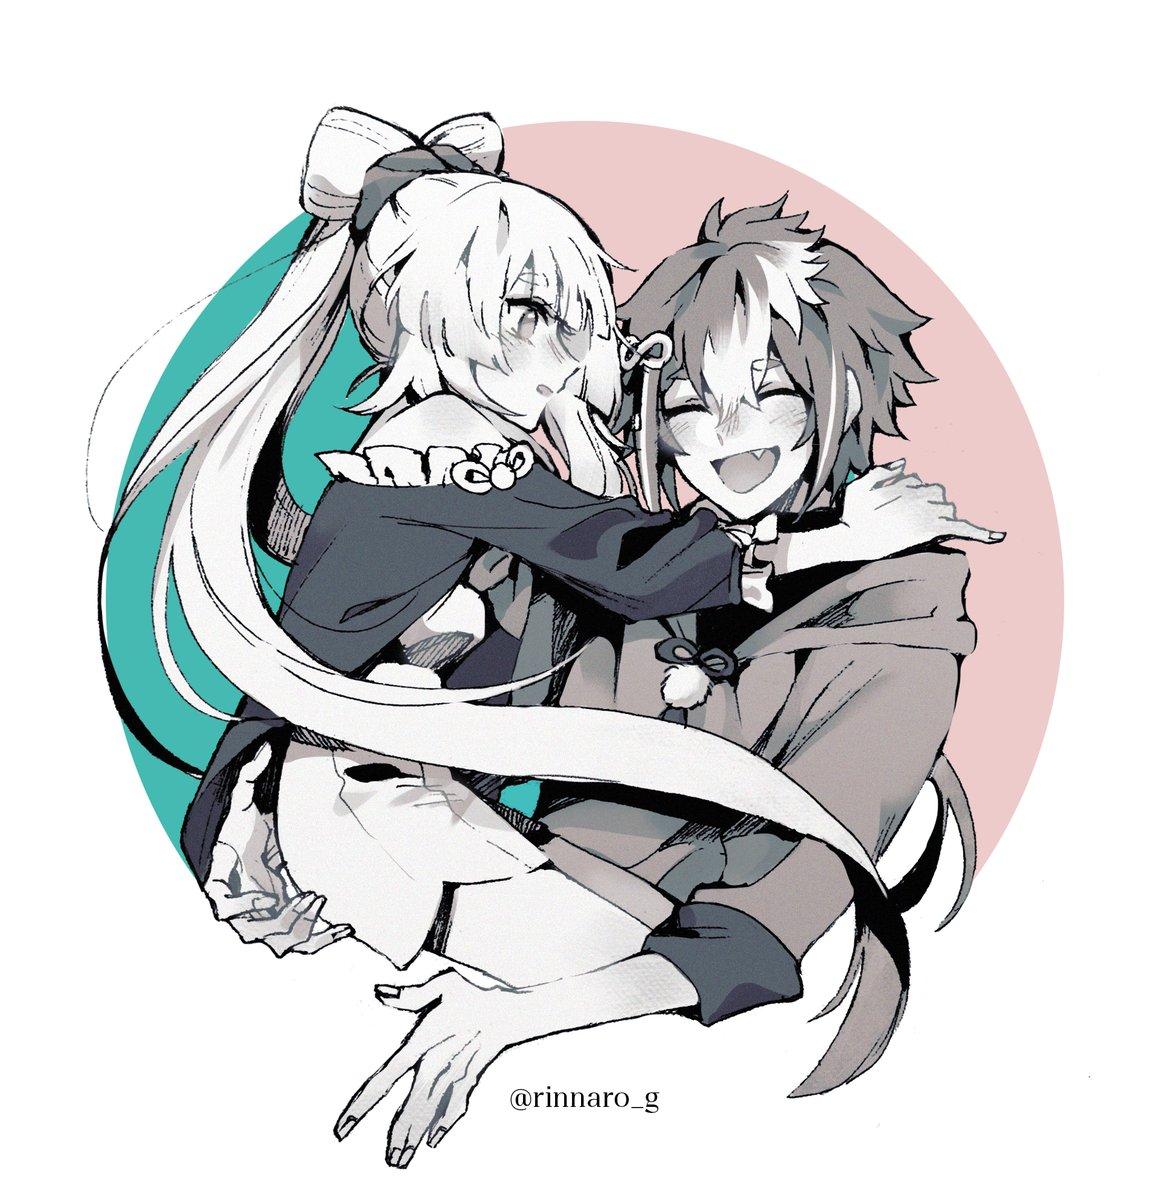 them  #原神 #GenshinImpact